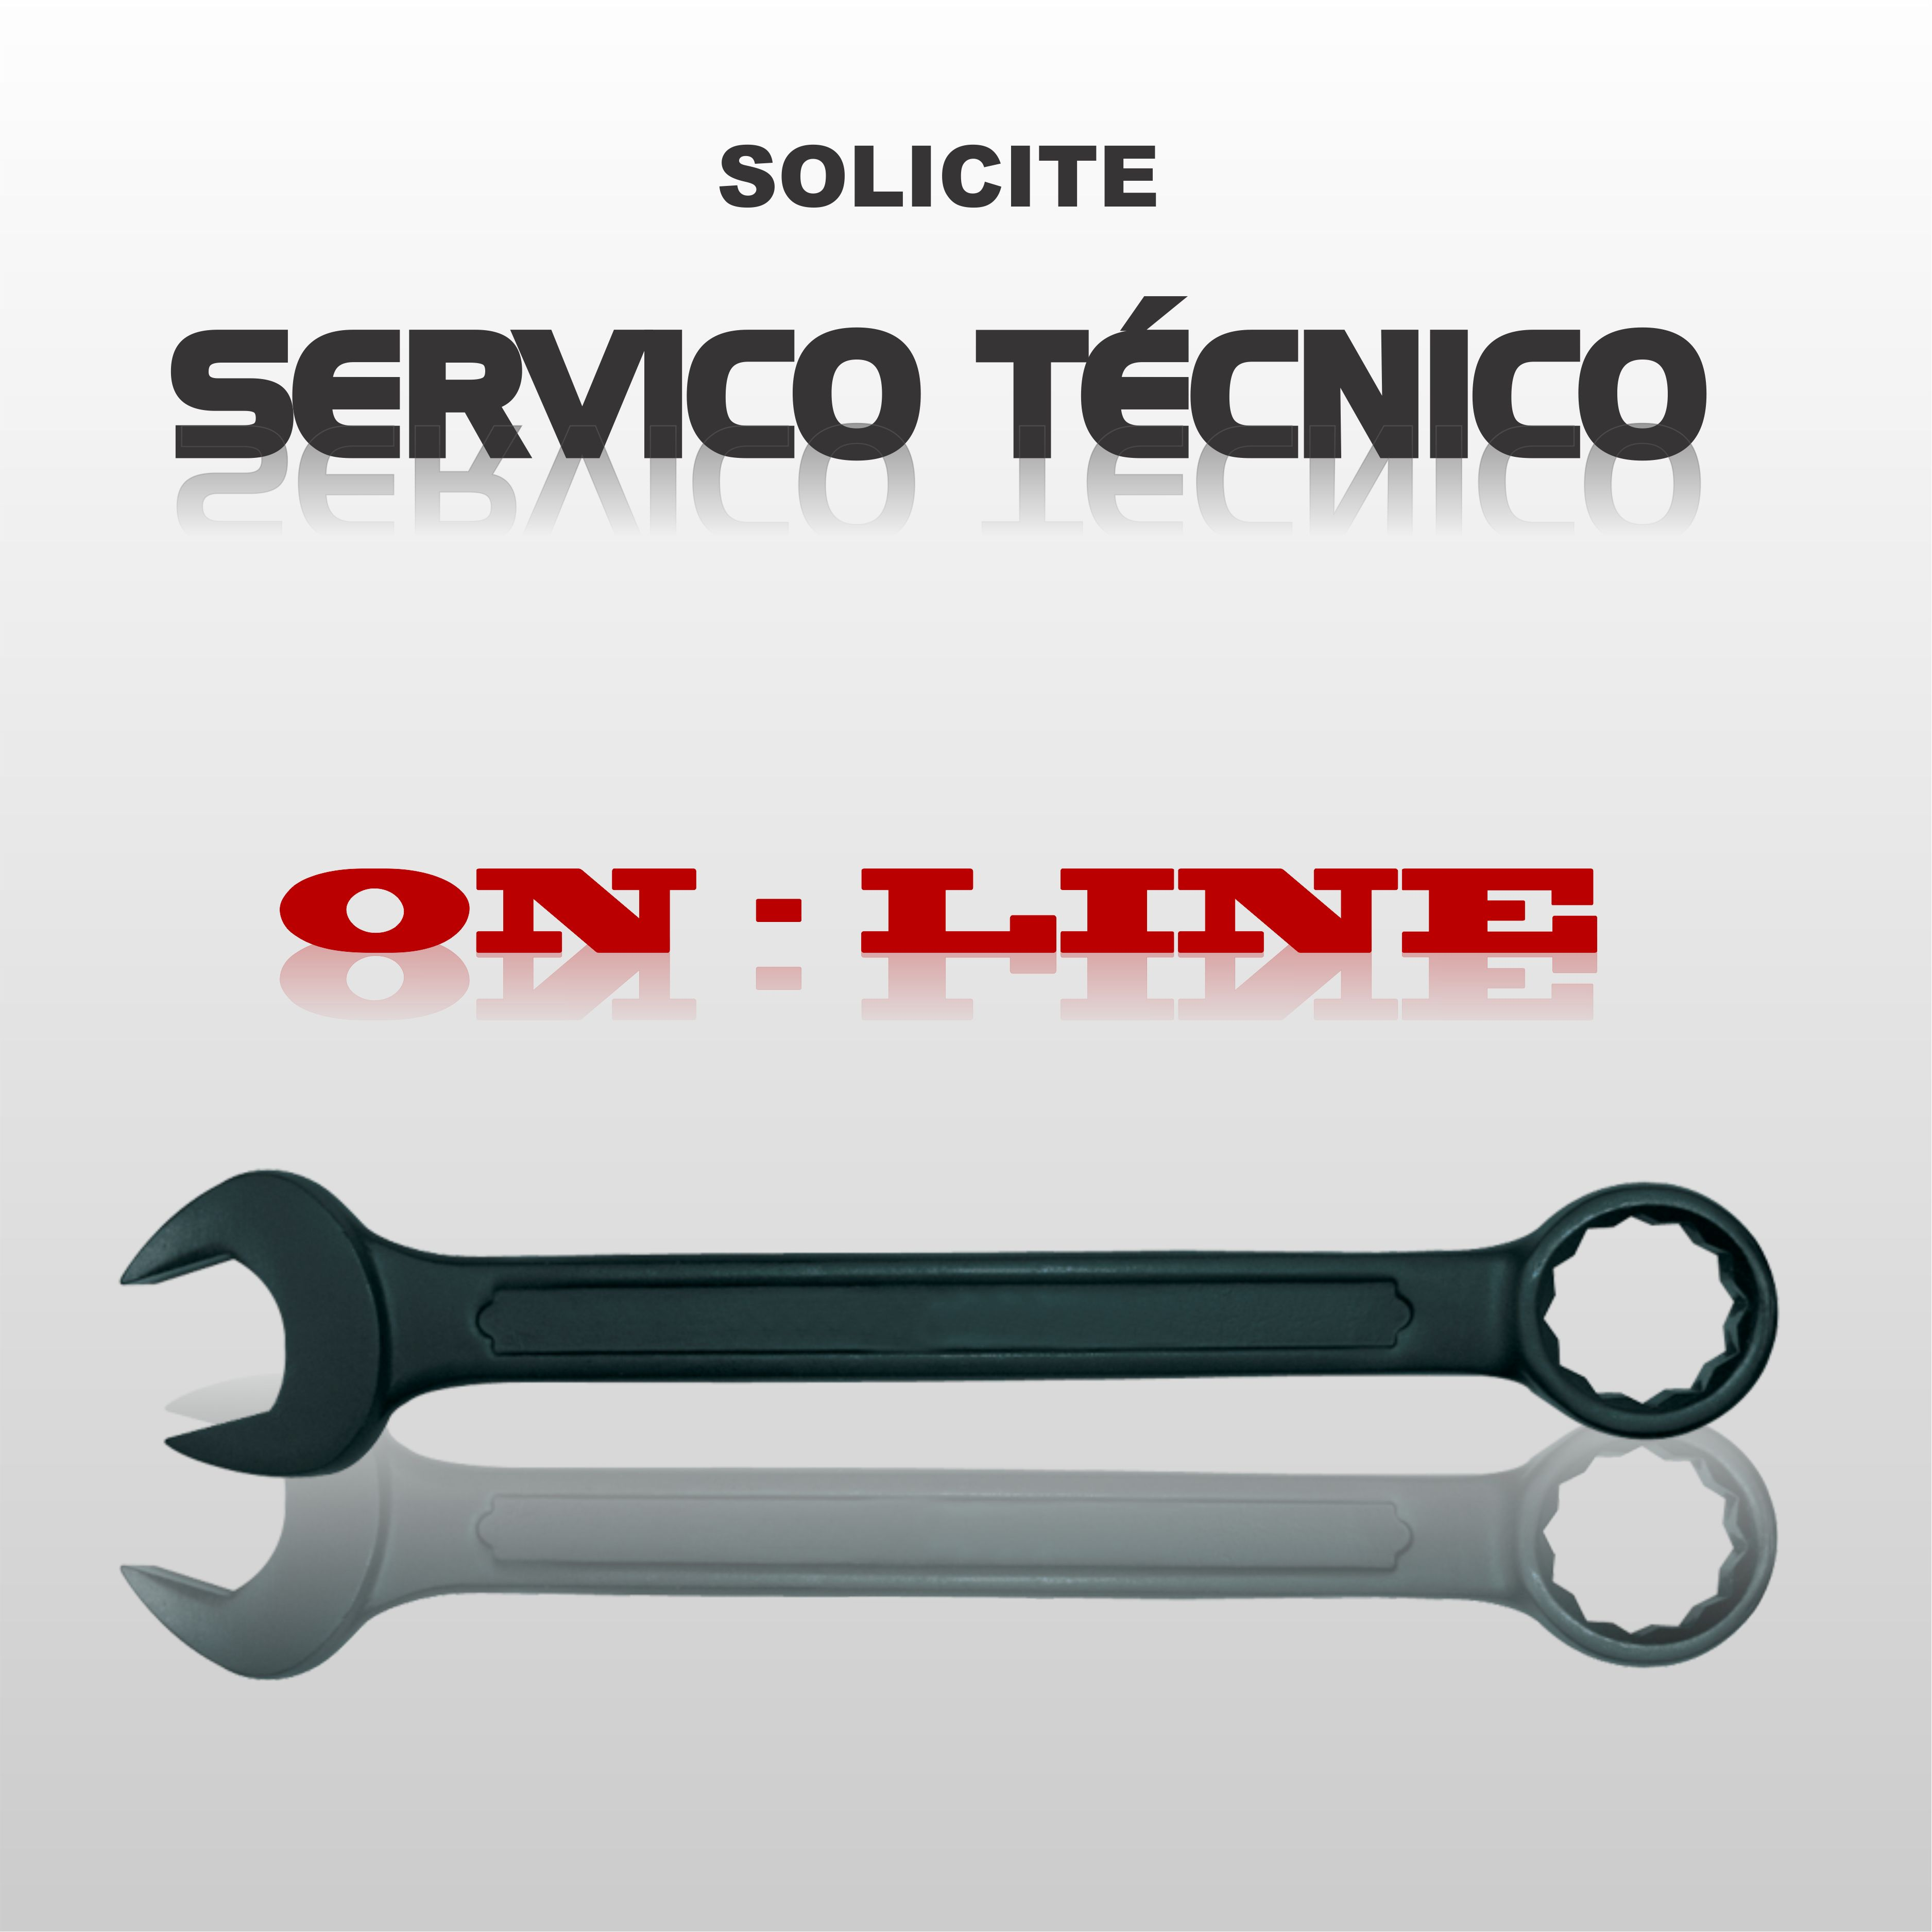 Servico técnico on-line